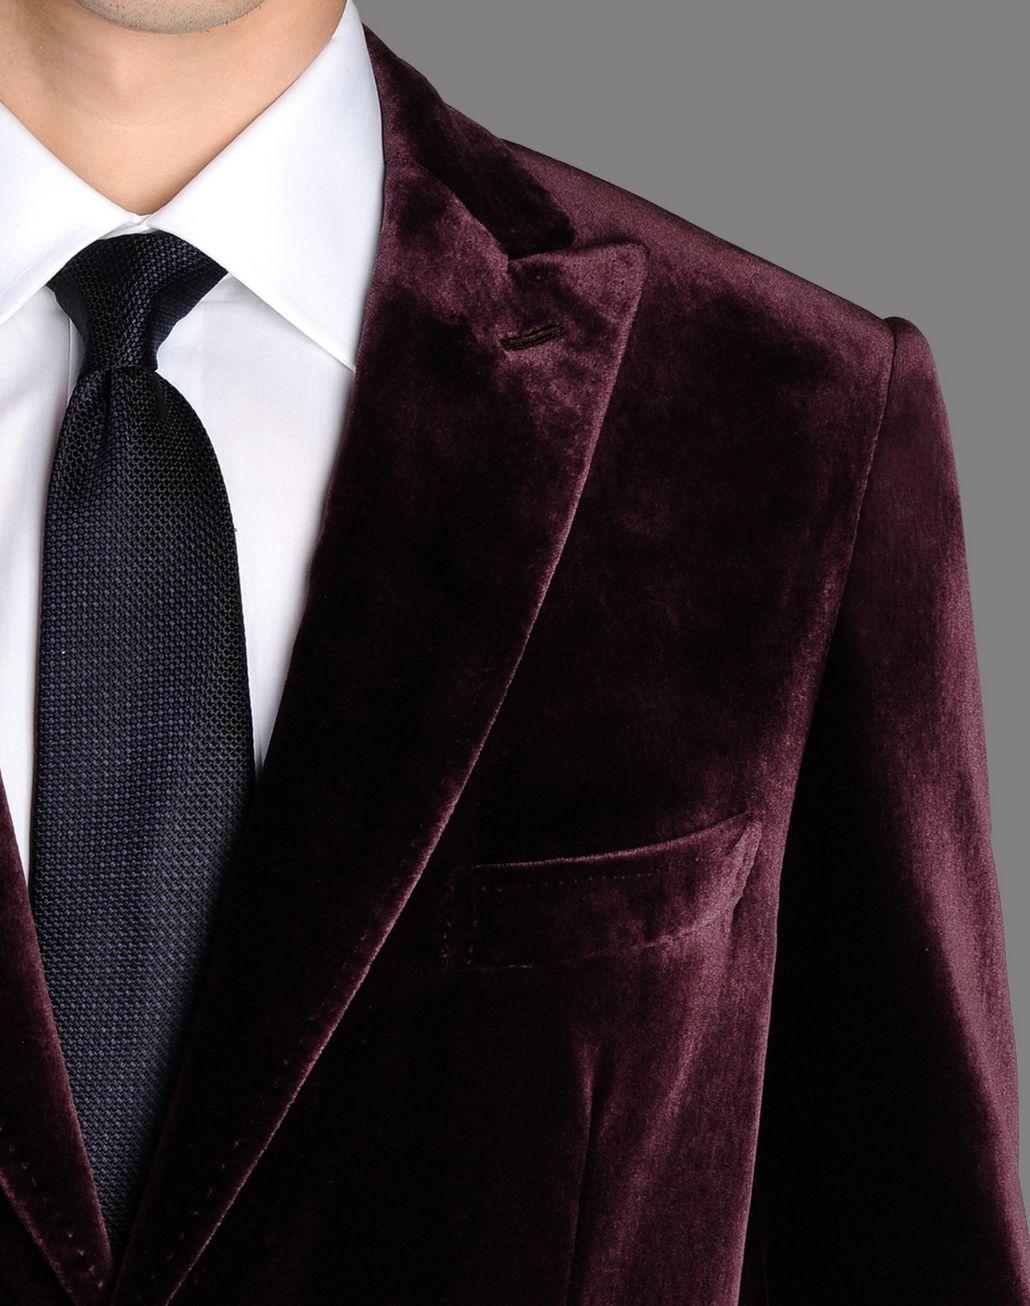 BRIONI burgundy velvet jacket with peaked lapels Suits & Jackets U d